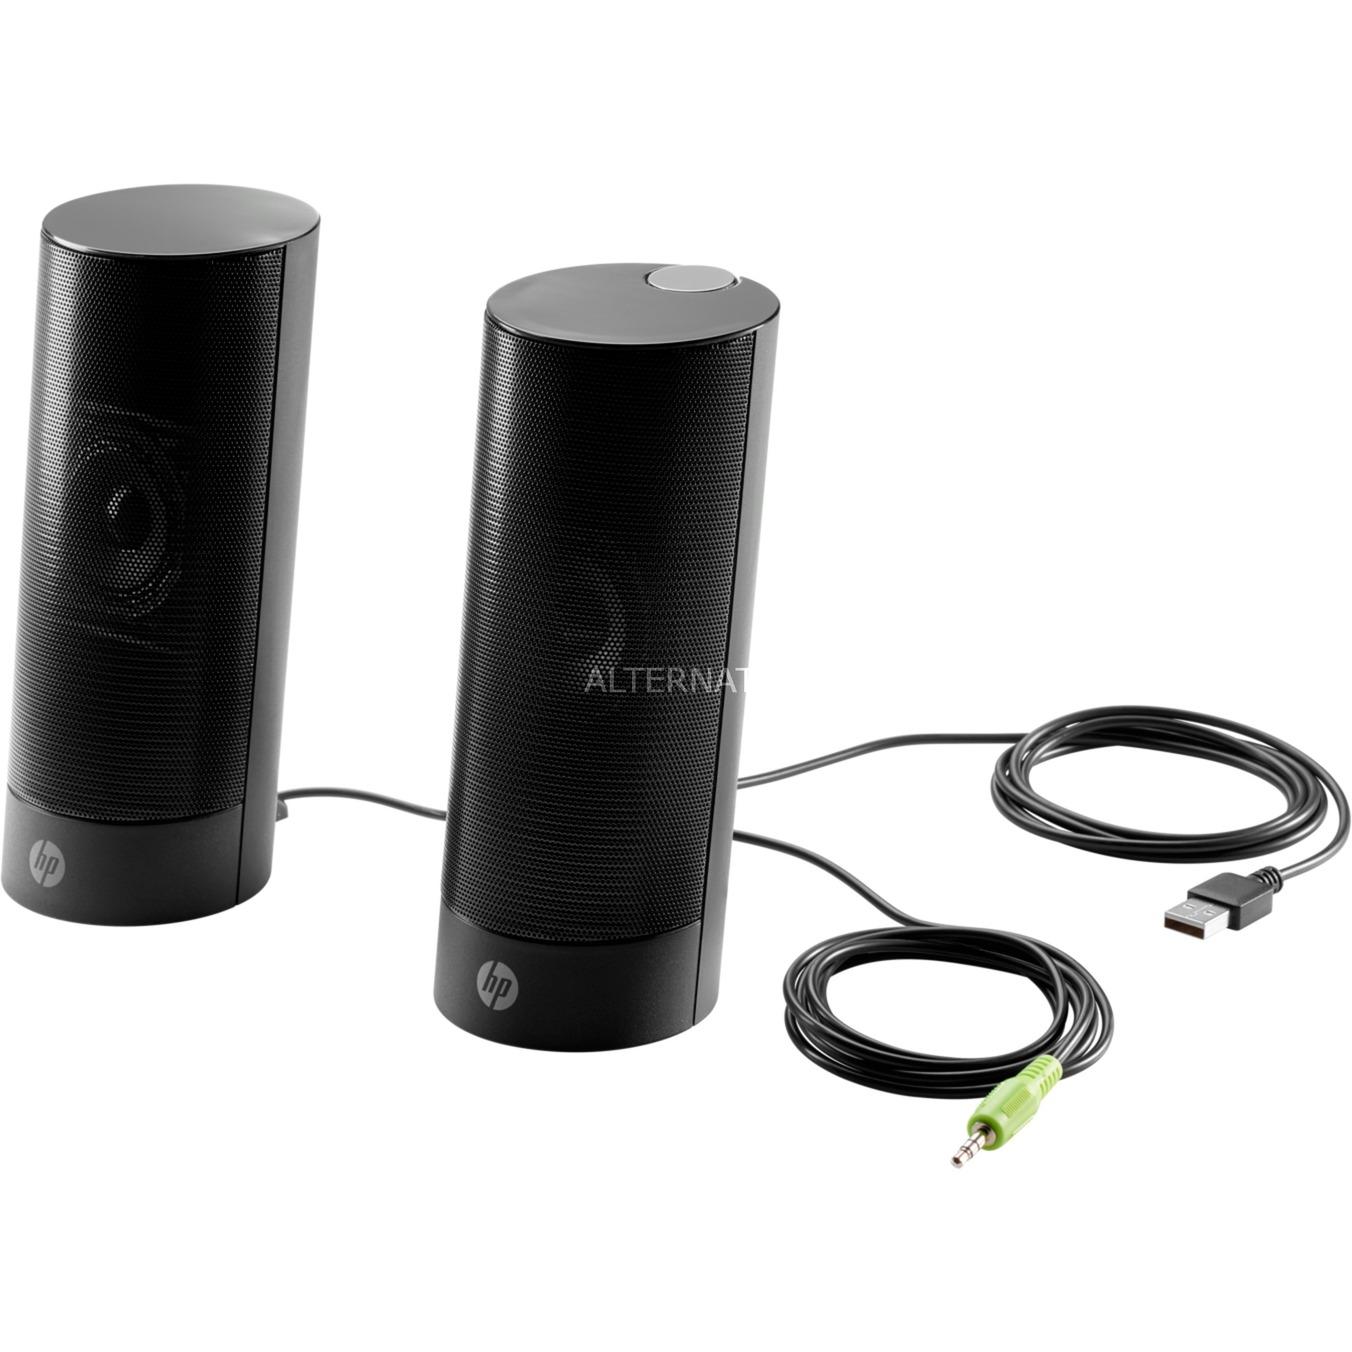 Altavoces USB Business v2, Altavoz